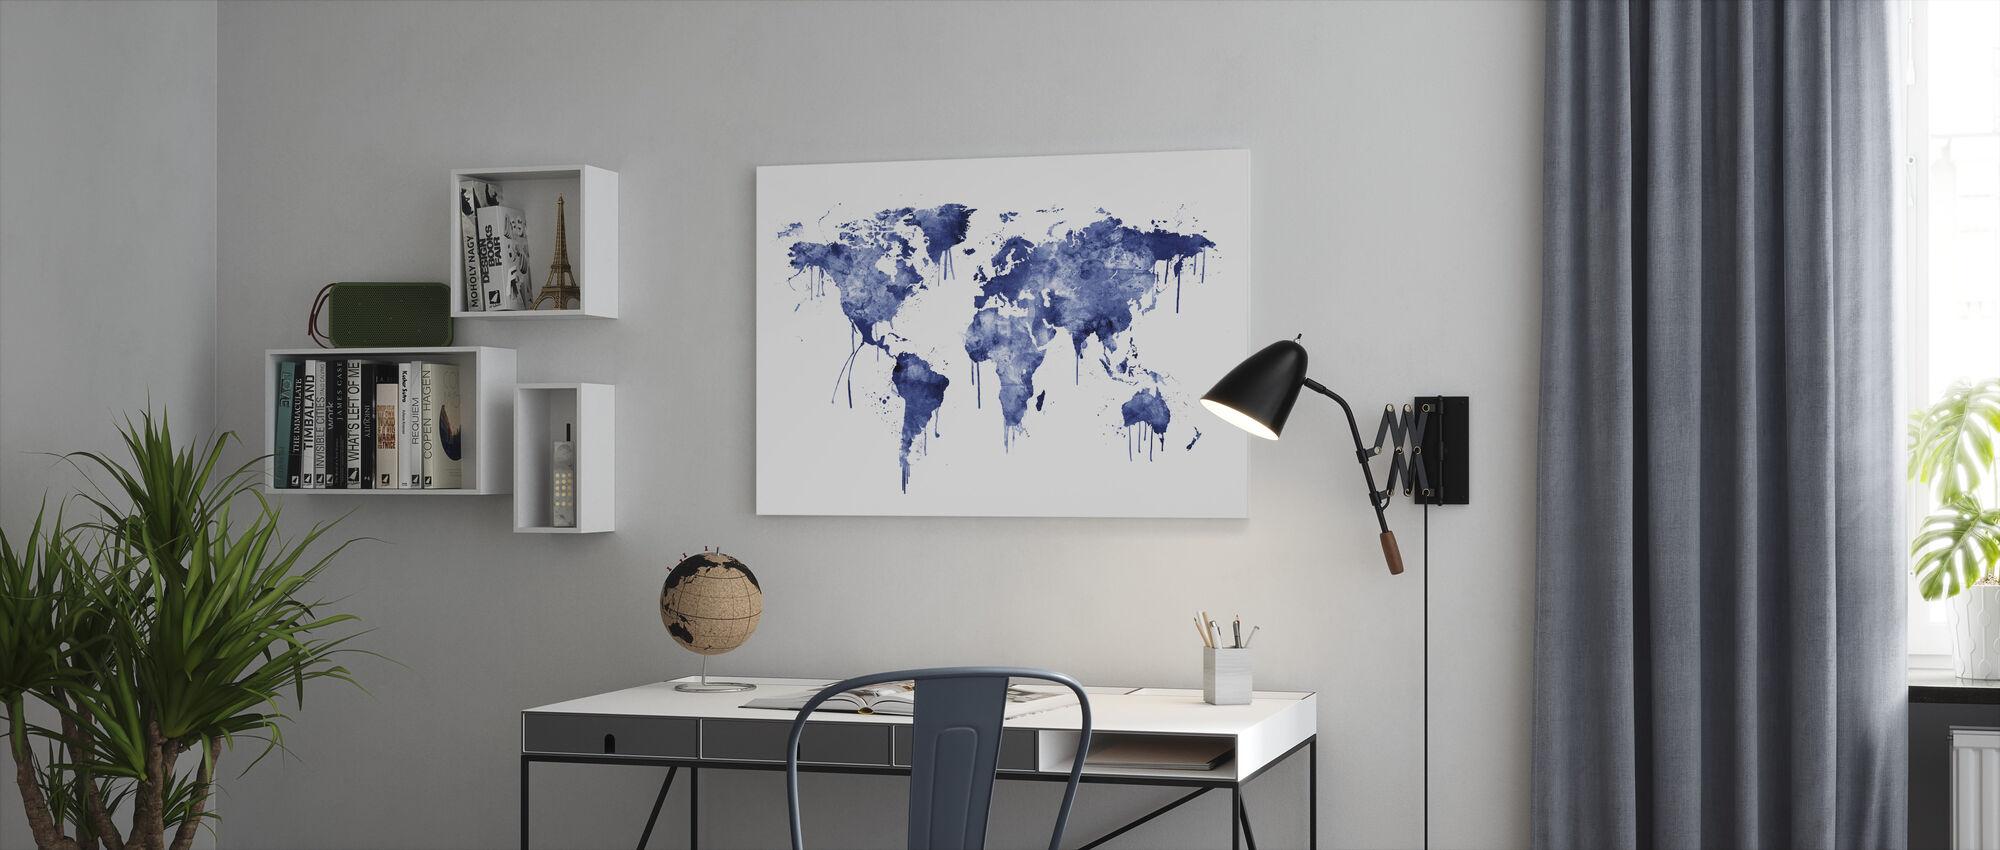 Watercolour World Map Blue - Canvas print - Office